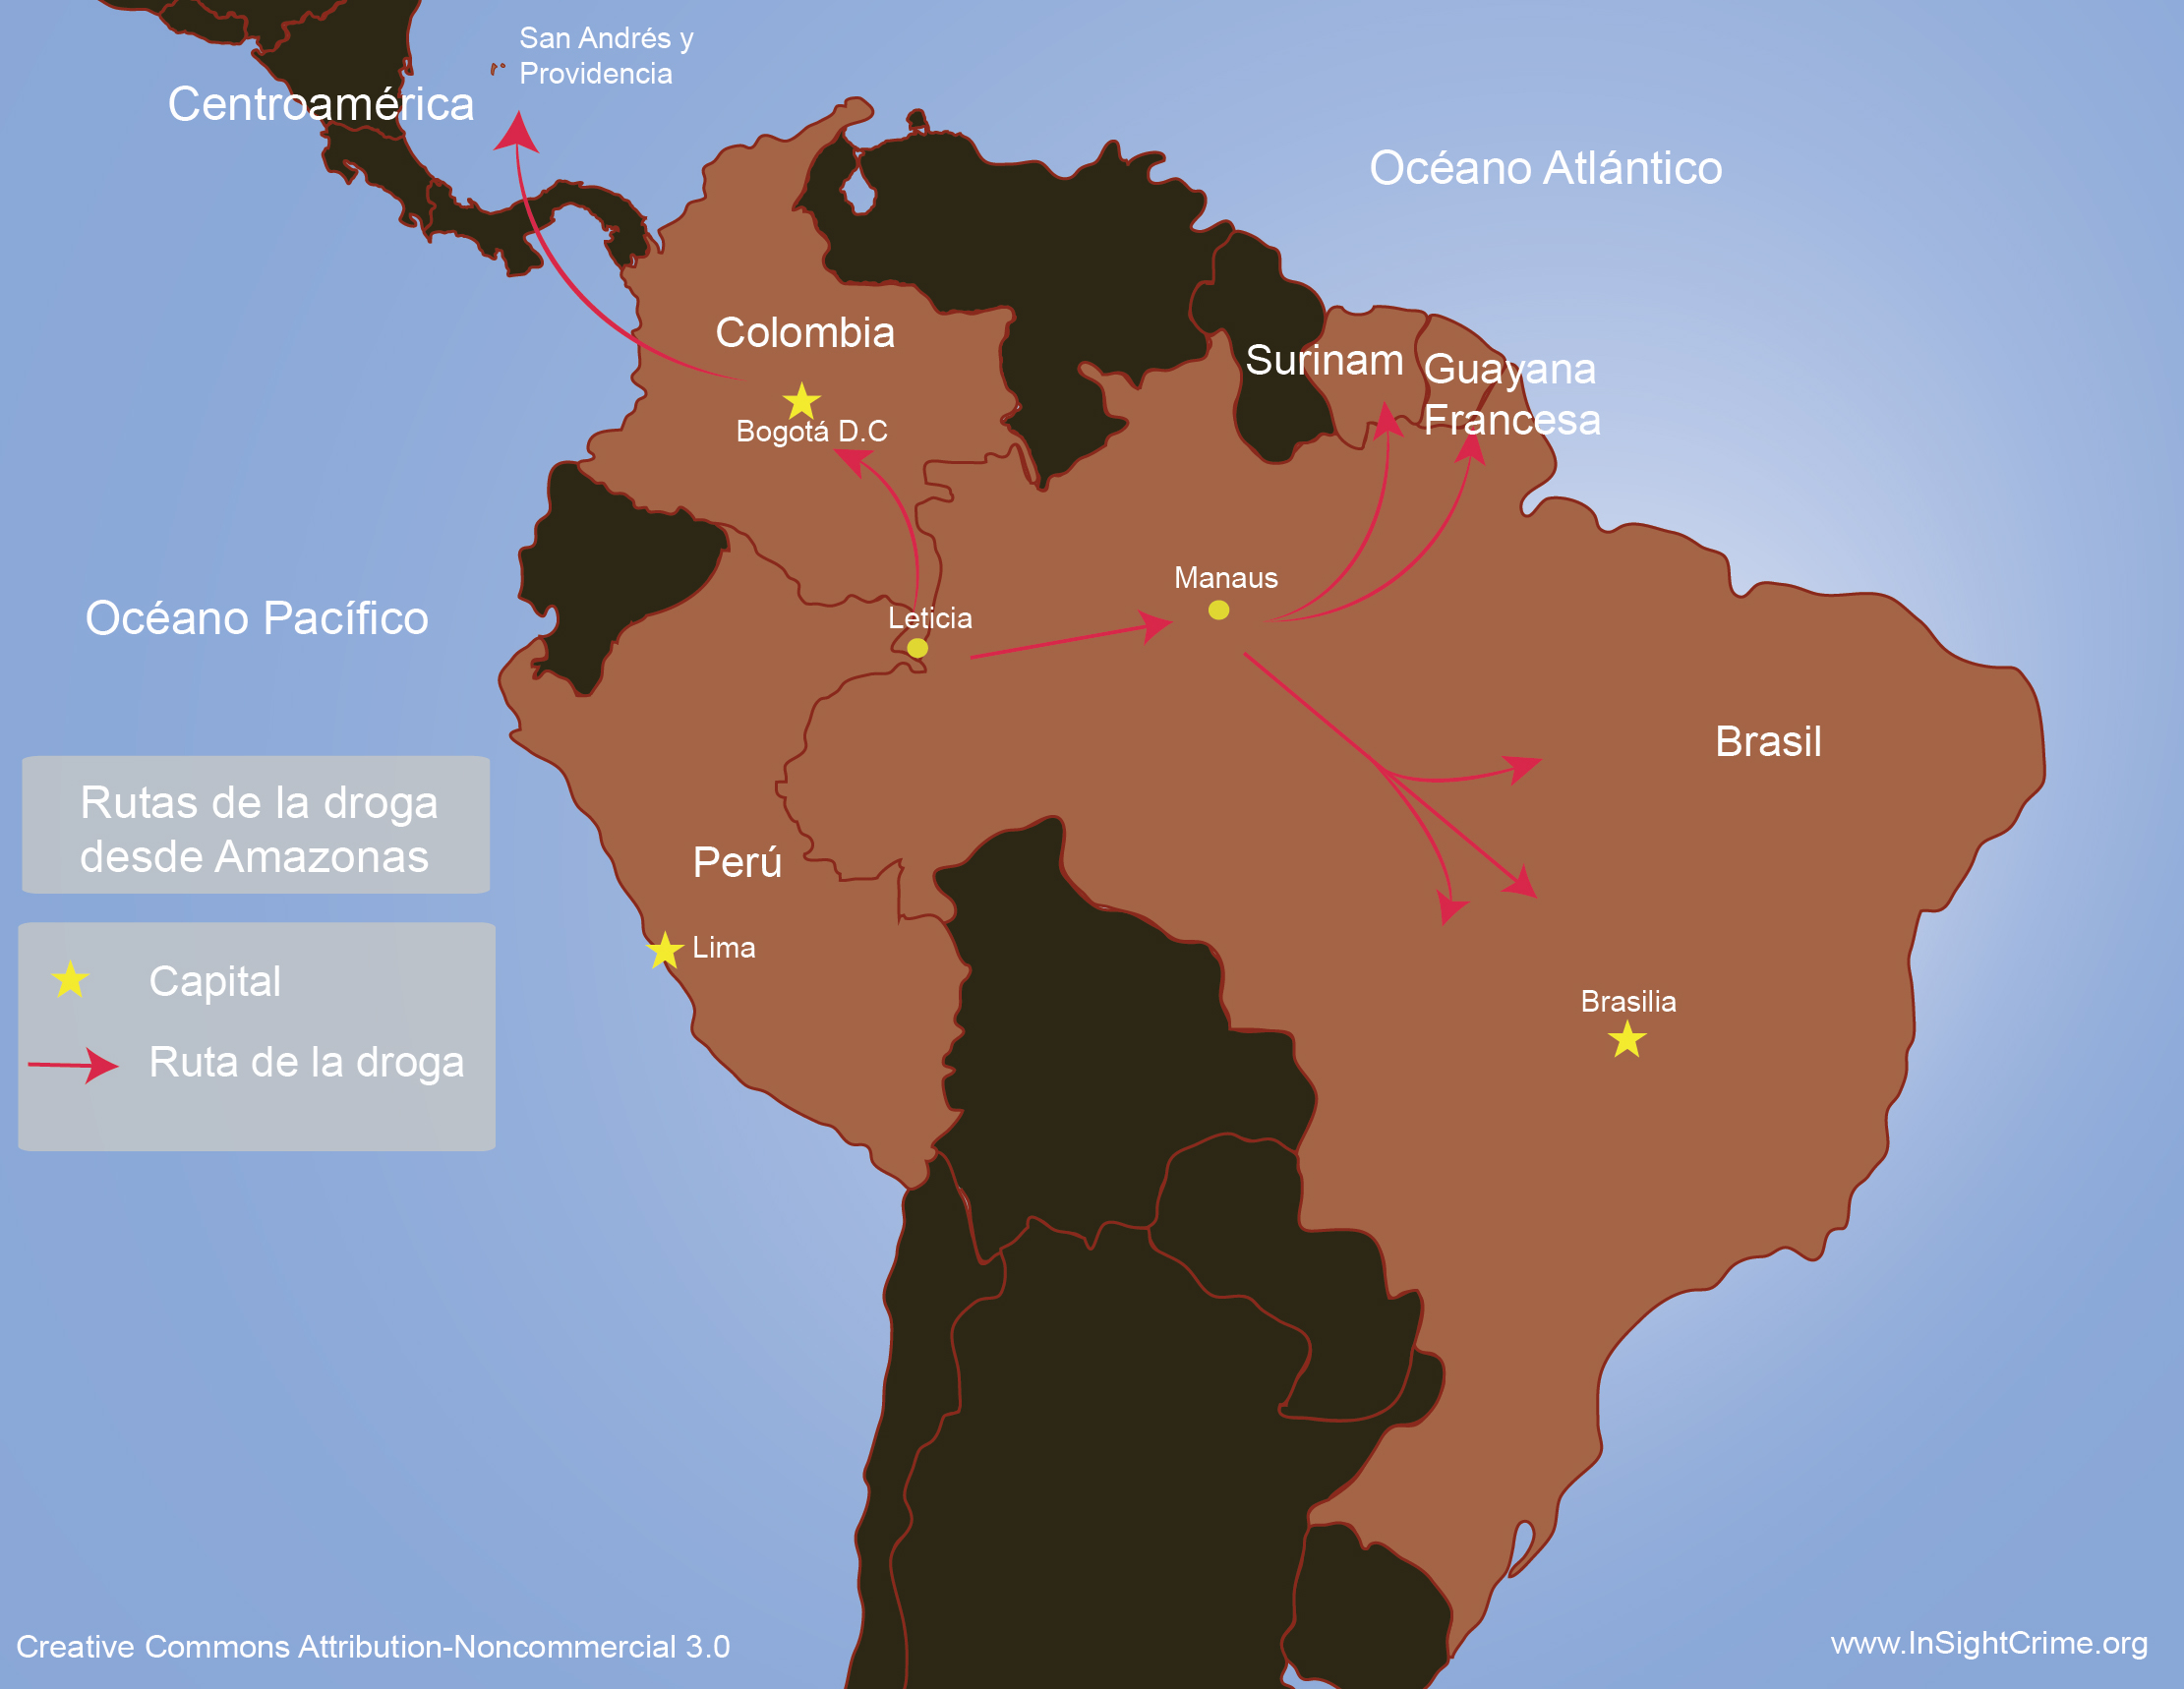 Rutas-droga-Amazonas1 copia